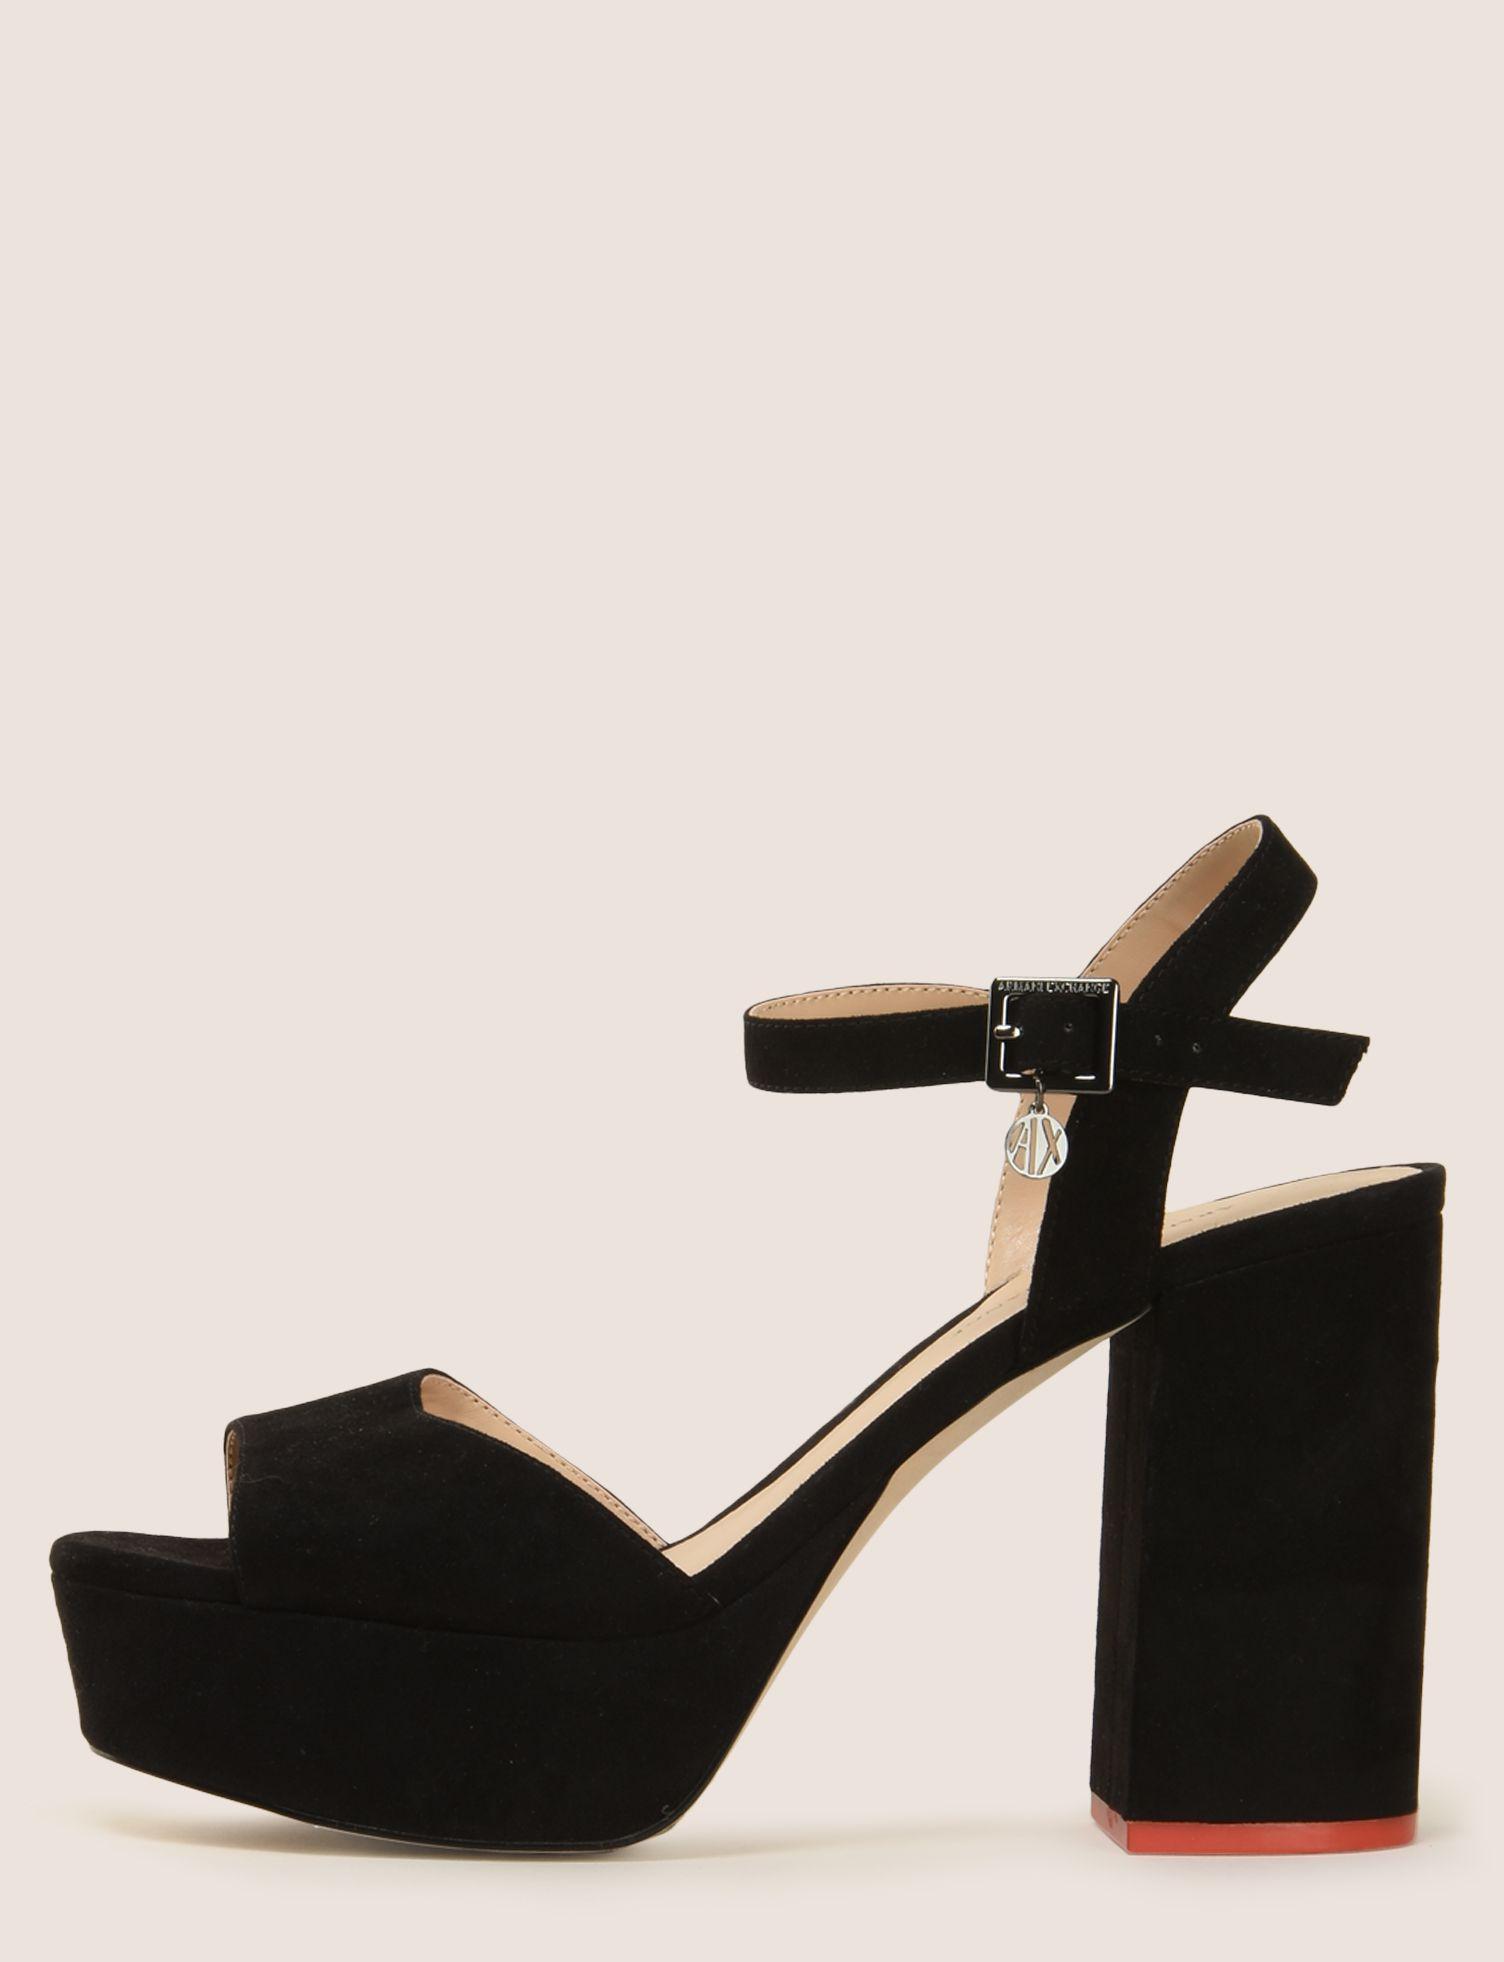 2f763968c49 Lyst - Armani Exchange Faux-suede Platform Sandals in Black